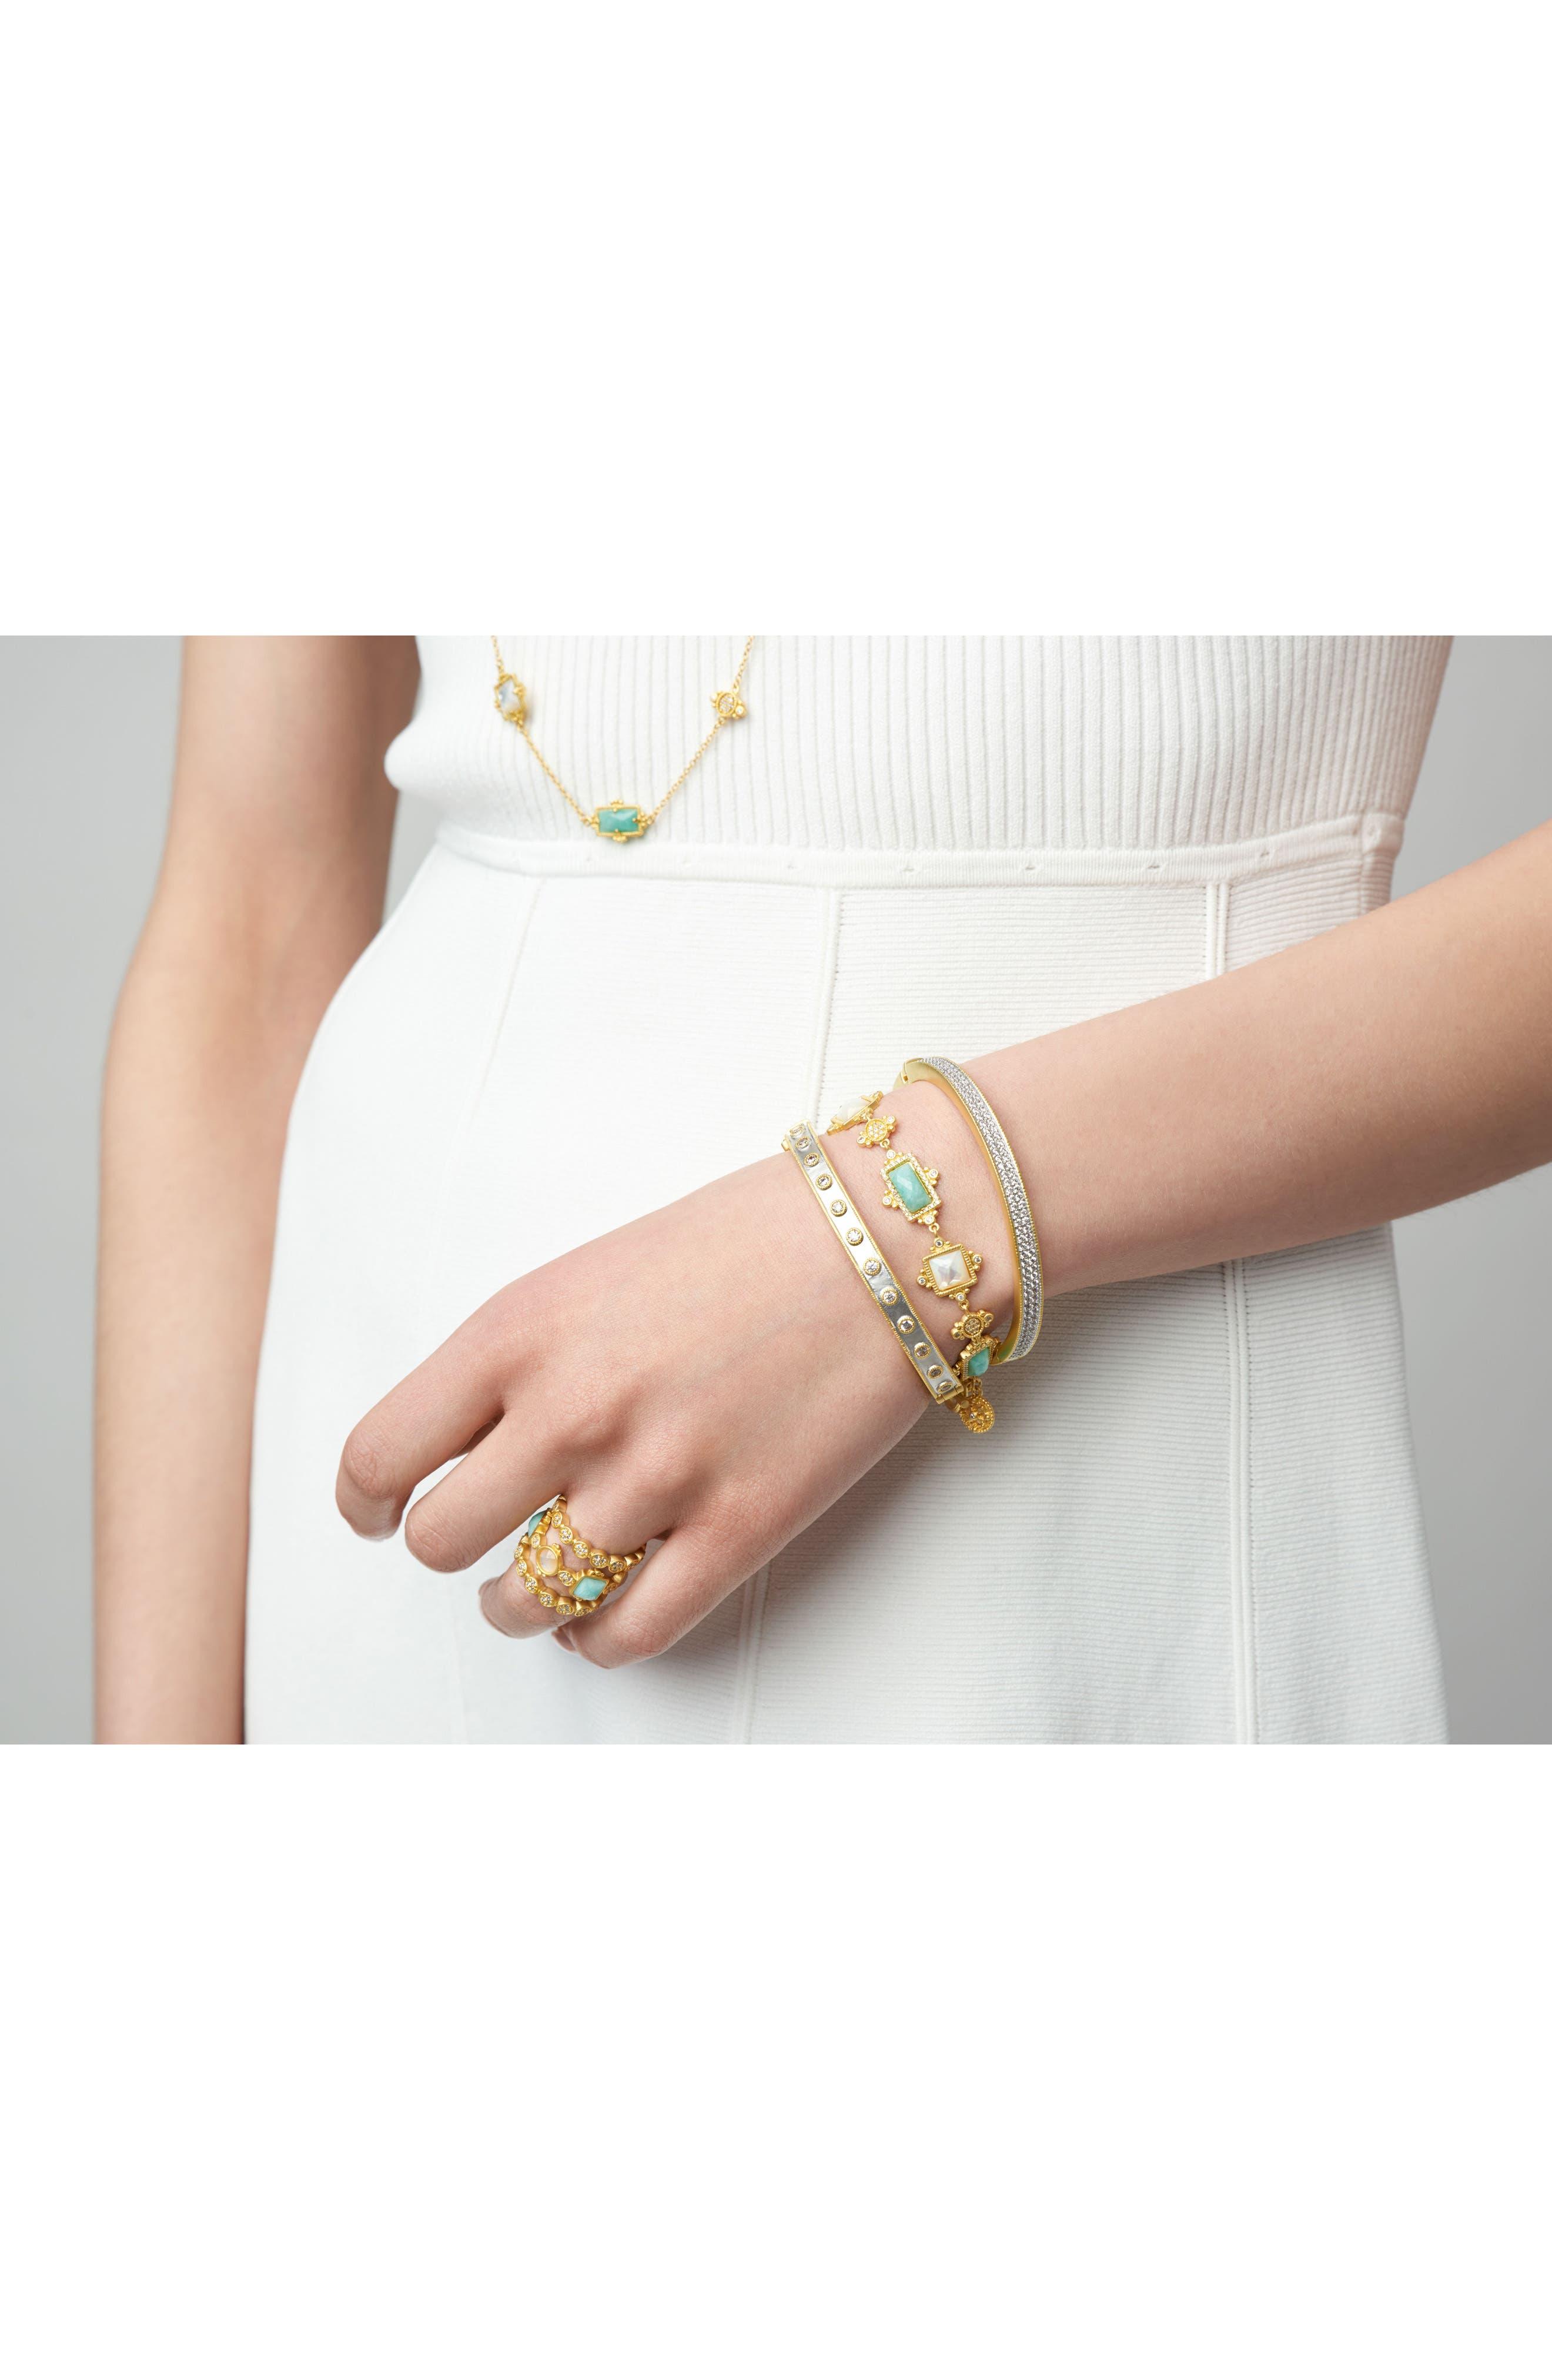 FREIDA ROTHMAN, Amazonian Allure Line Bracelet, Alternate thumbnail 2, color, 710